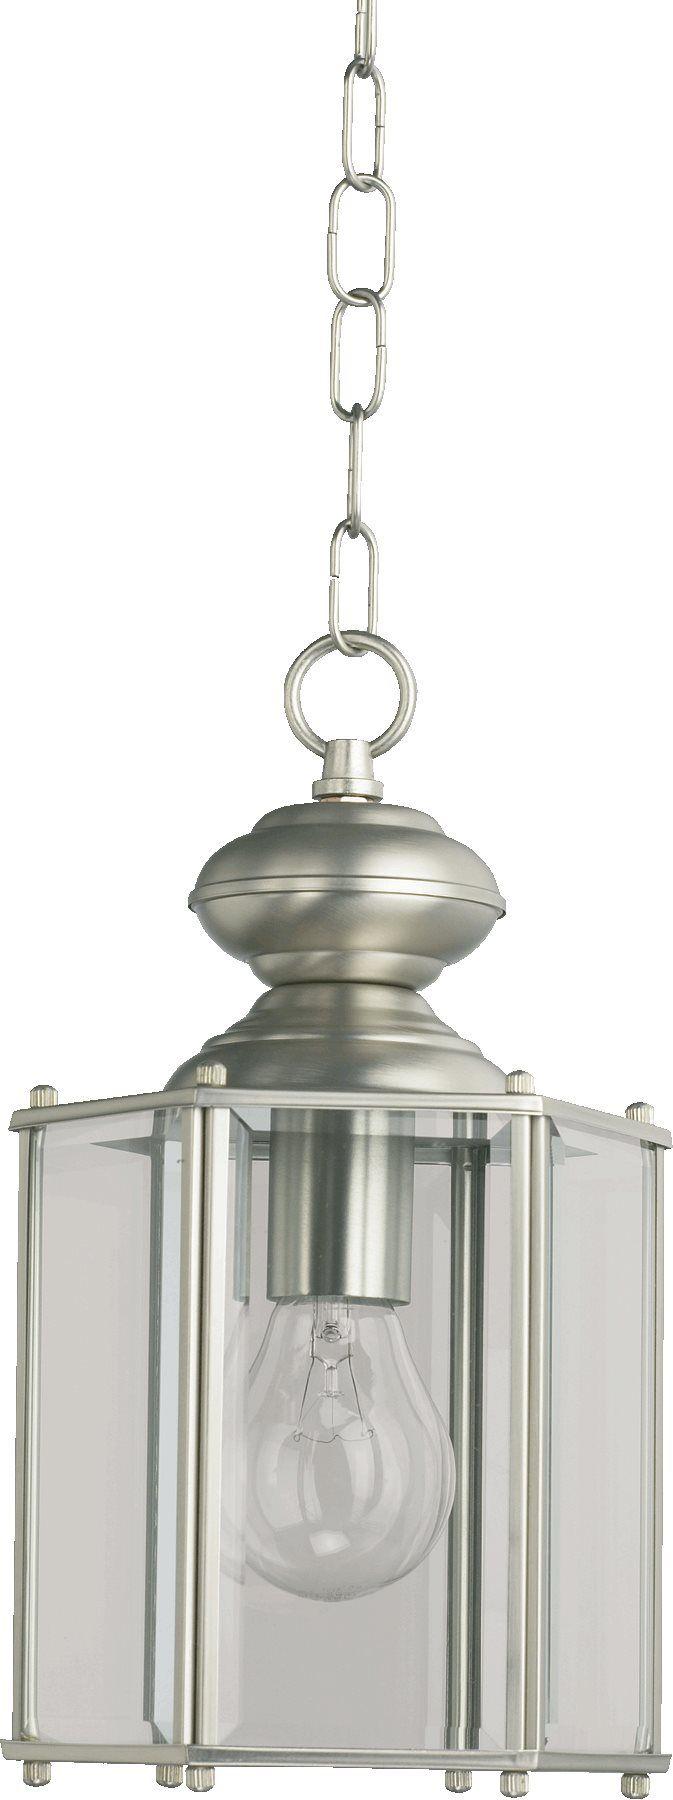 South Shore Decorating: Quorum Lighting 711 Transitional Outdoor Hanging Light QR-711